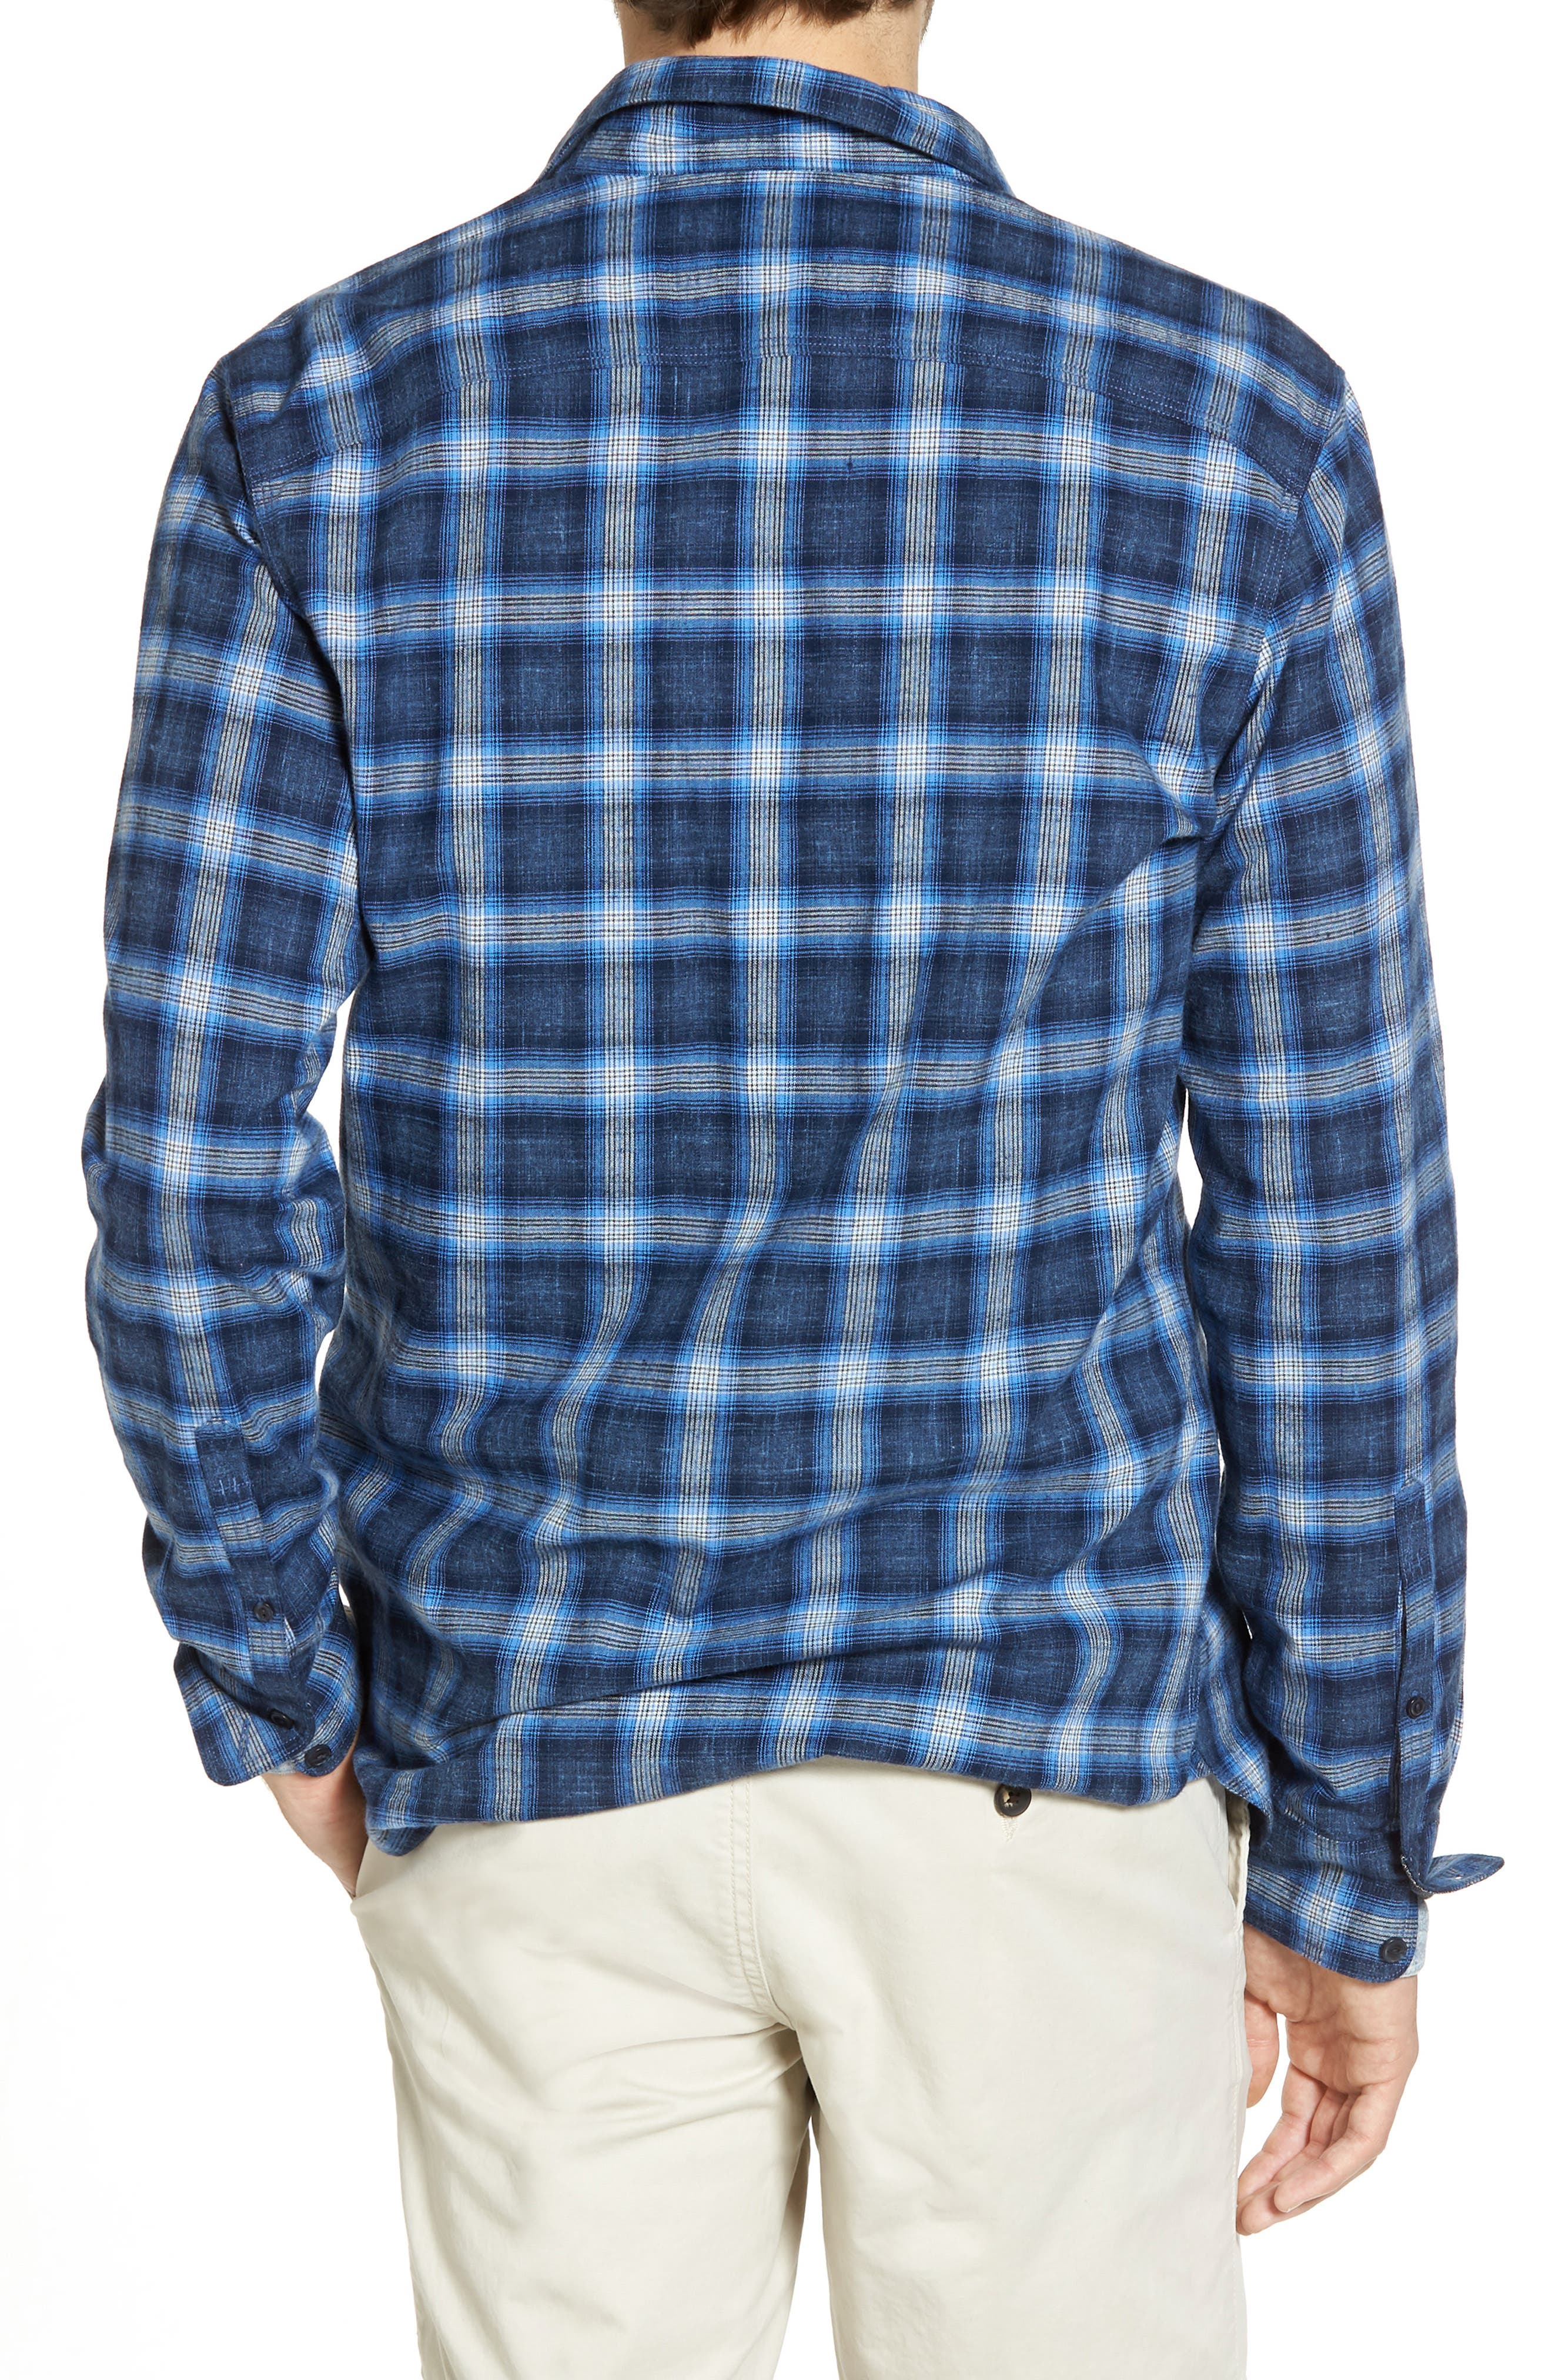 Trim Fit Plaid Sport Shirt,                             Alternate thumbnail 3, color,                             Black Blue Homespun Plaid